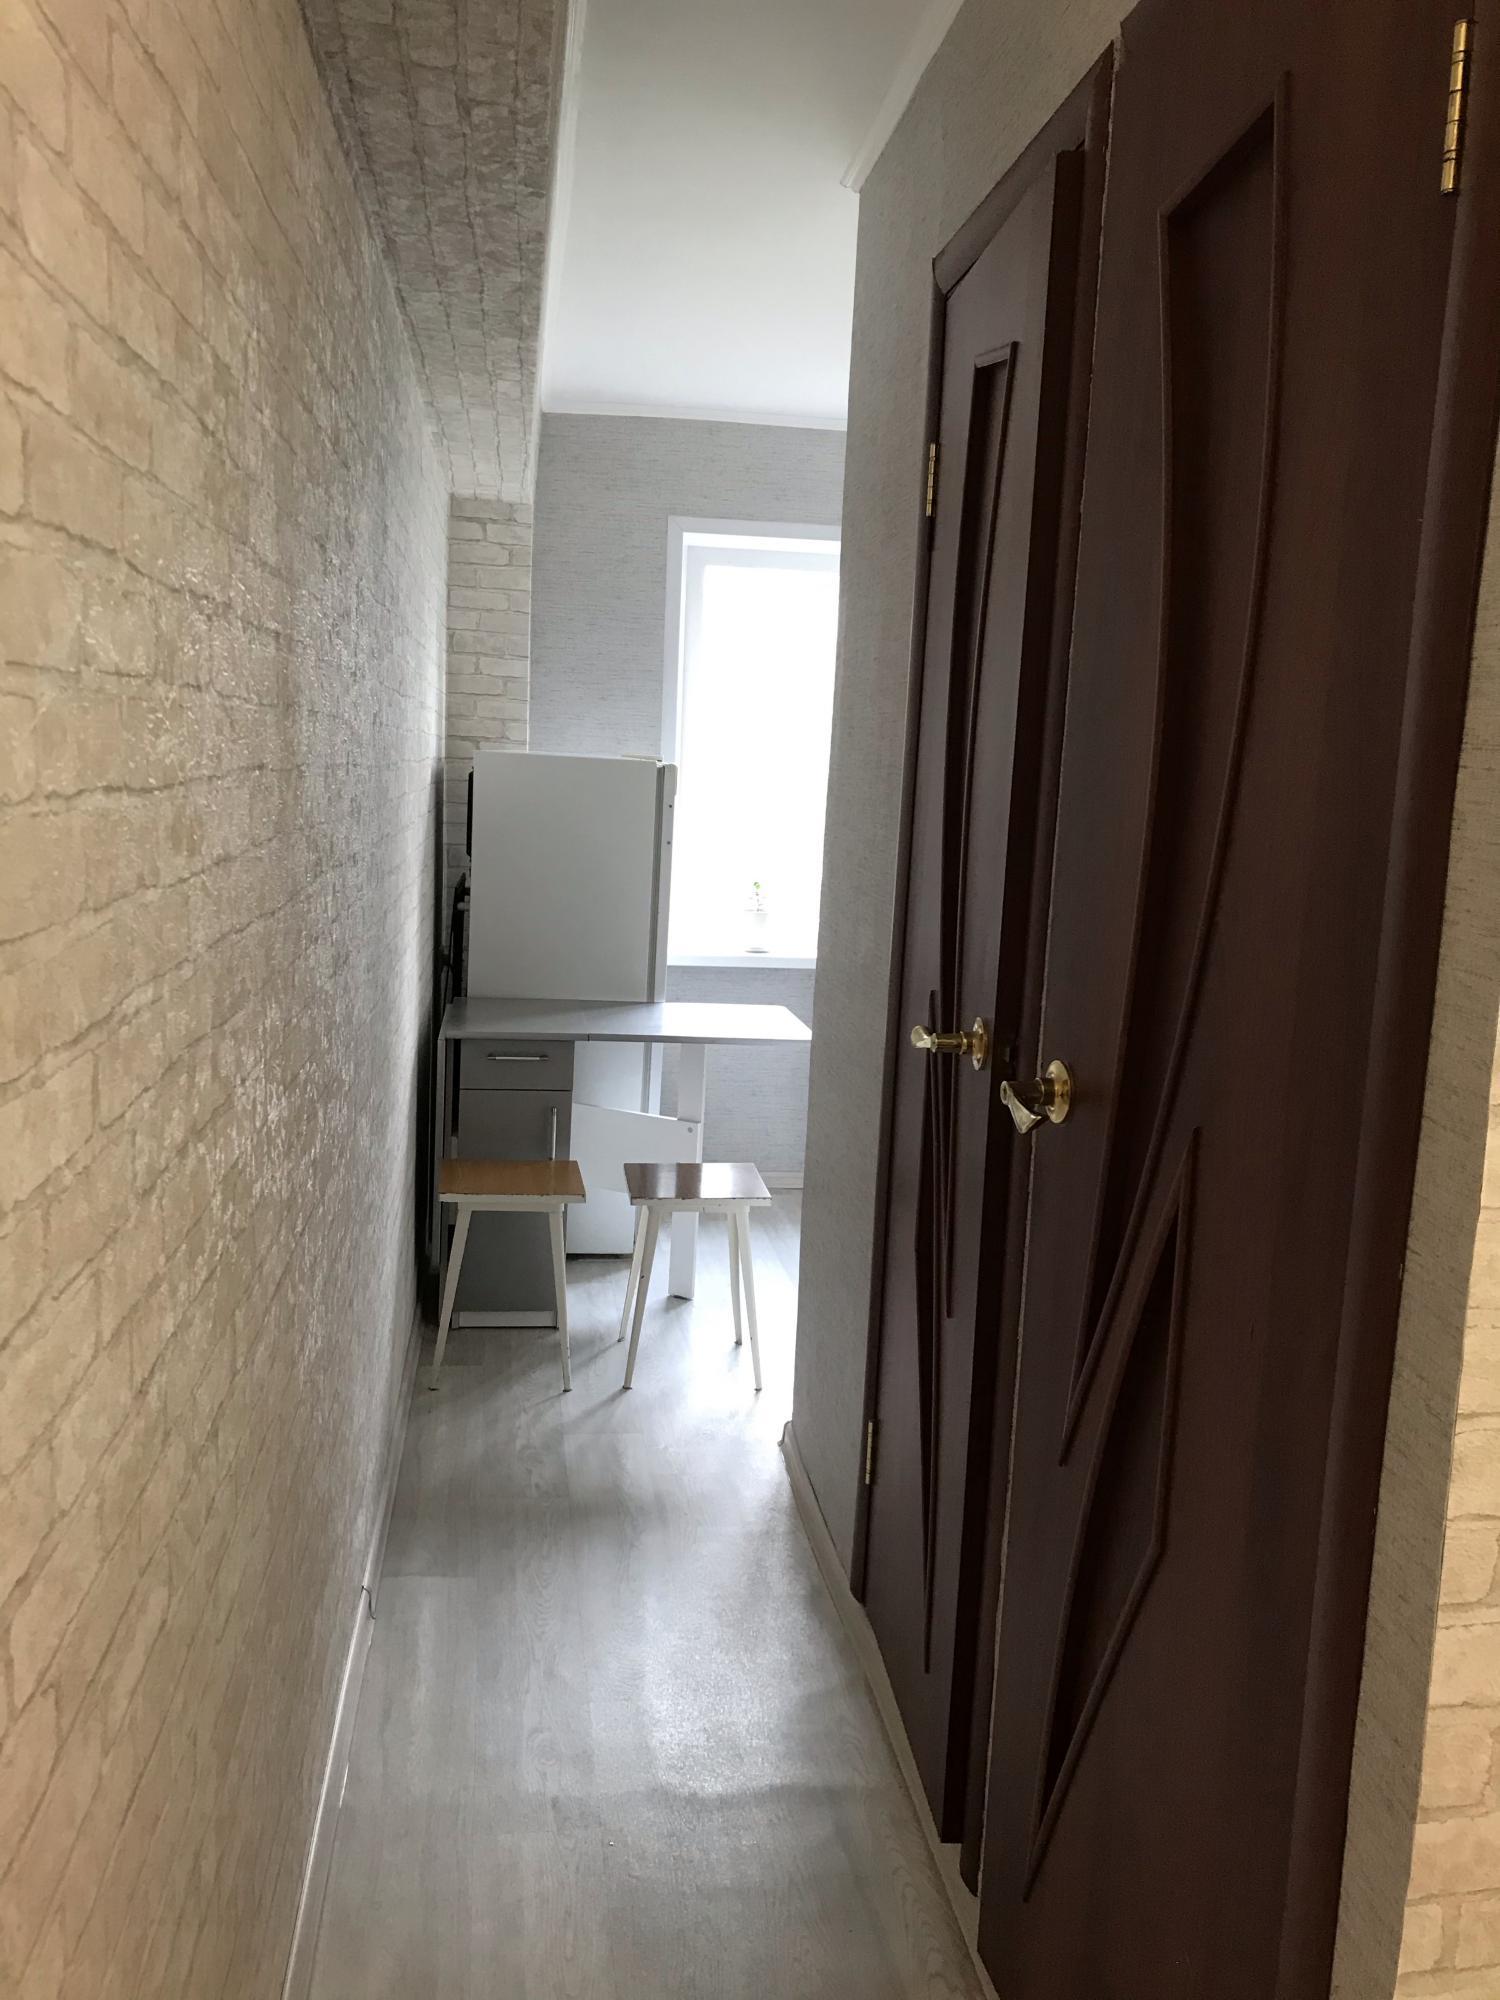 2к квартира улица Академика Павлова, 62, Россия | 15000 | аренда в Красноярске фото 4